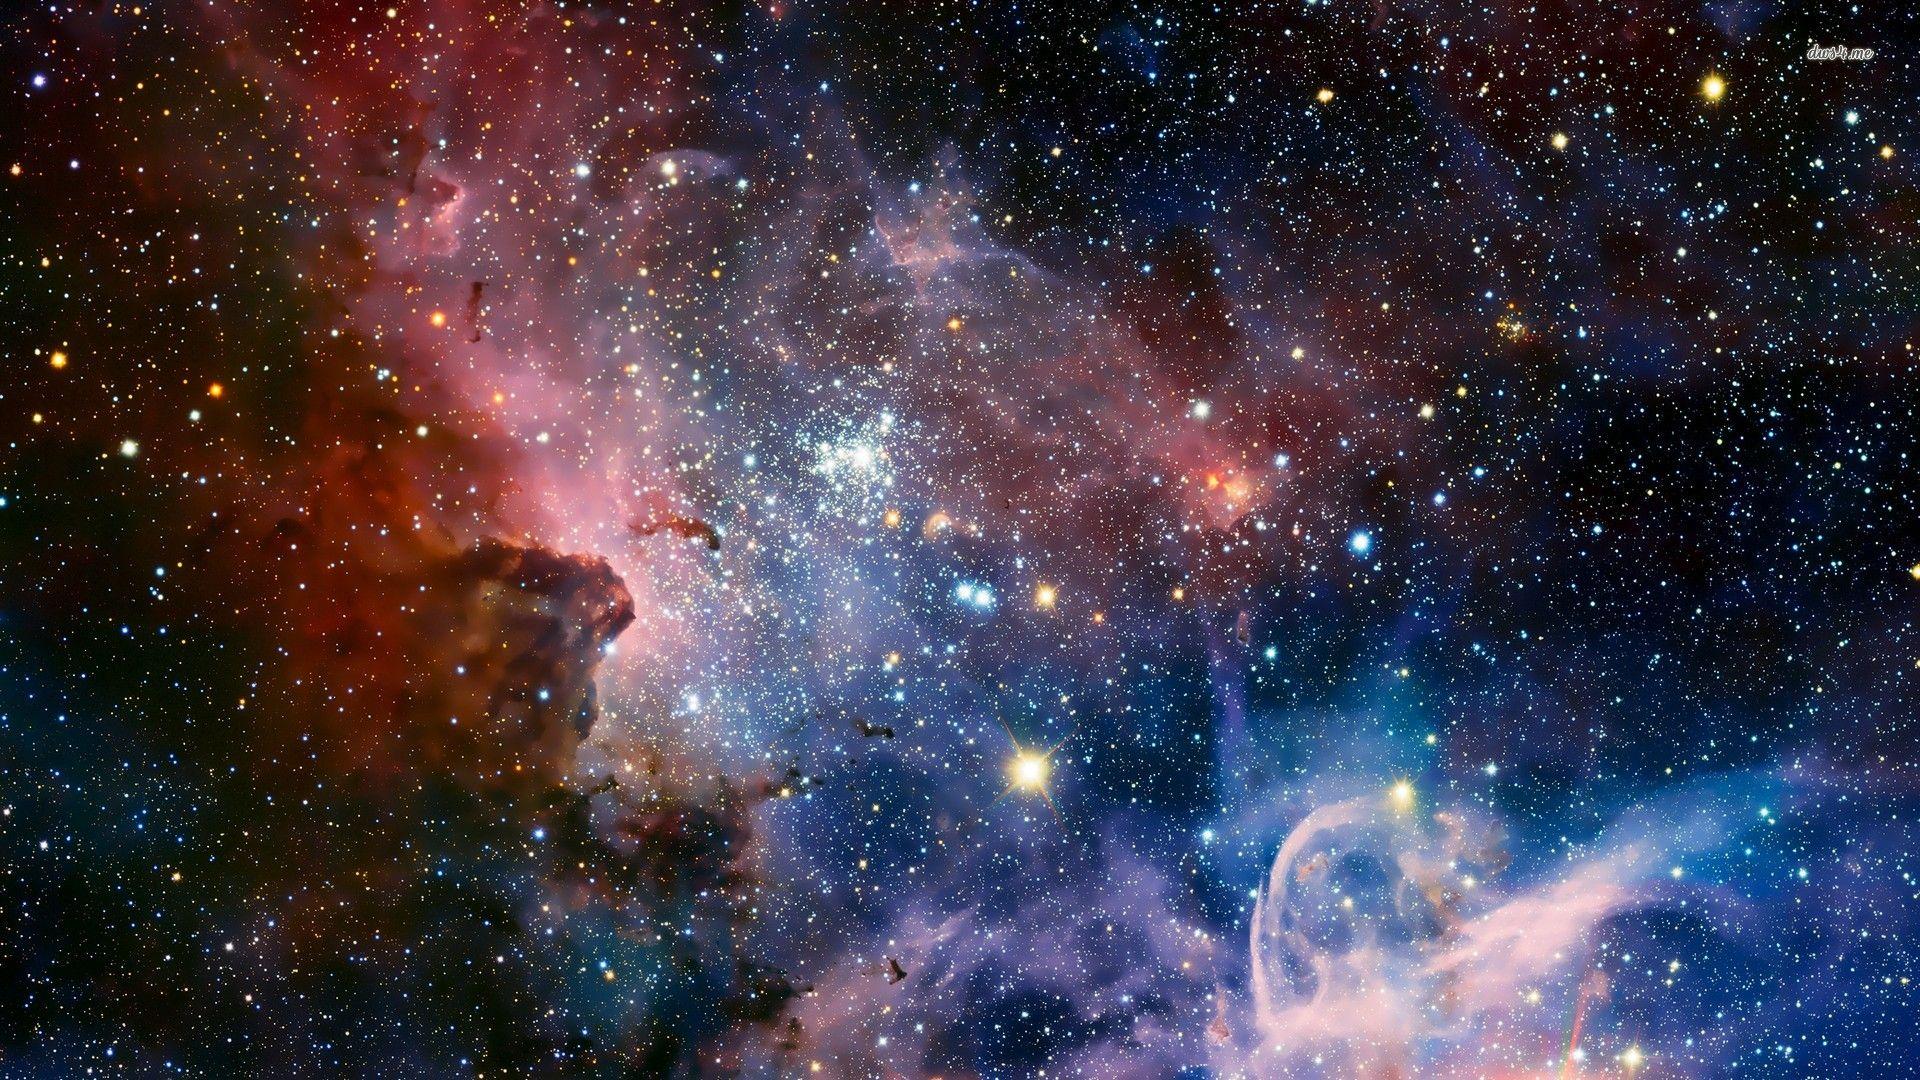 Http Cdn Paper4pc Com Images Carina Nebula Wallpaper 2 Jpg Oboi Galaktika Foto Fony Galaktiki